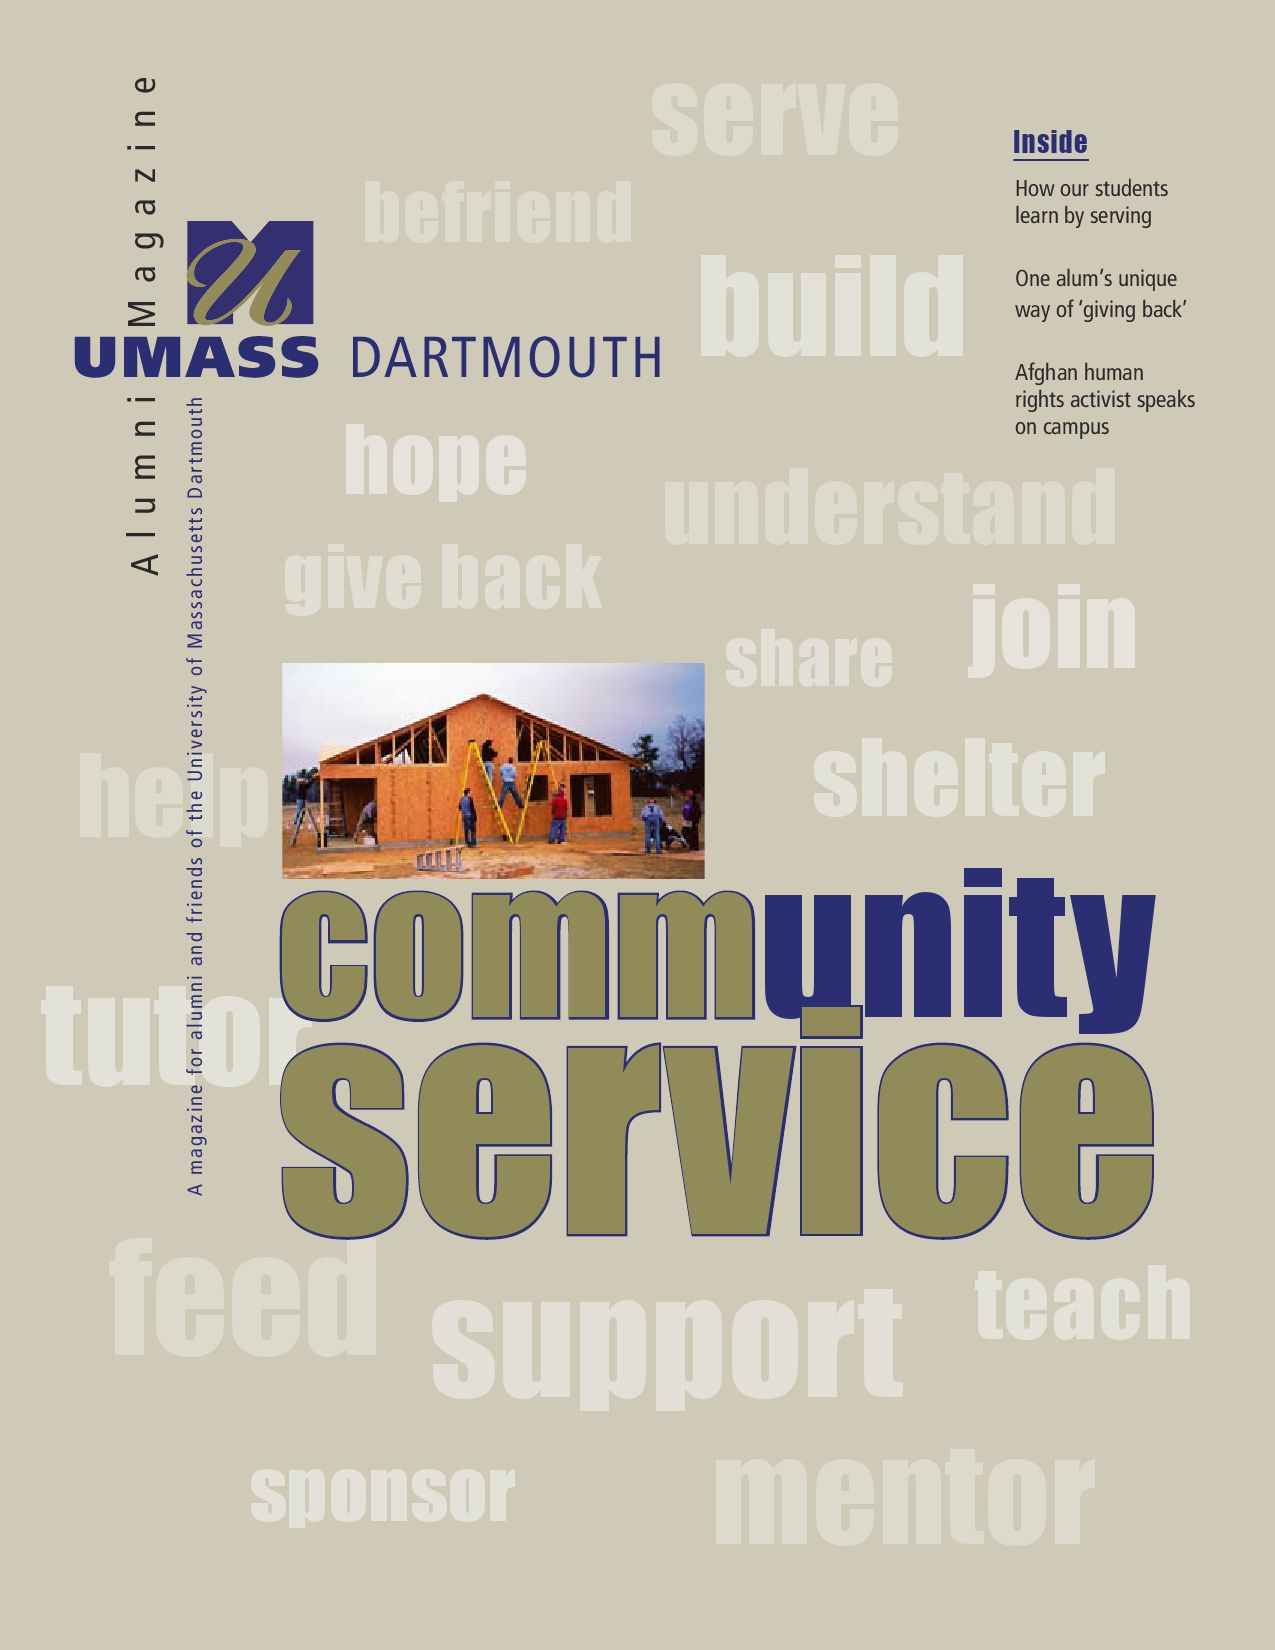 Umass dartmouth magazine spring 05 by umass dartmouth issuu fandeluxe Gallery